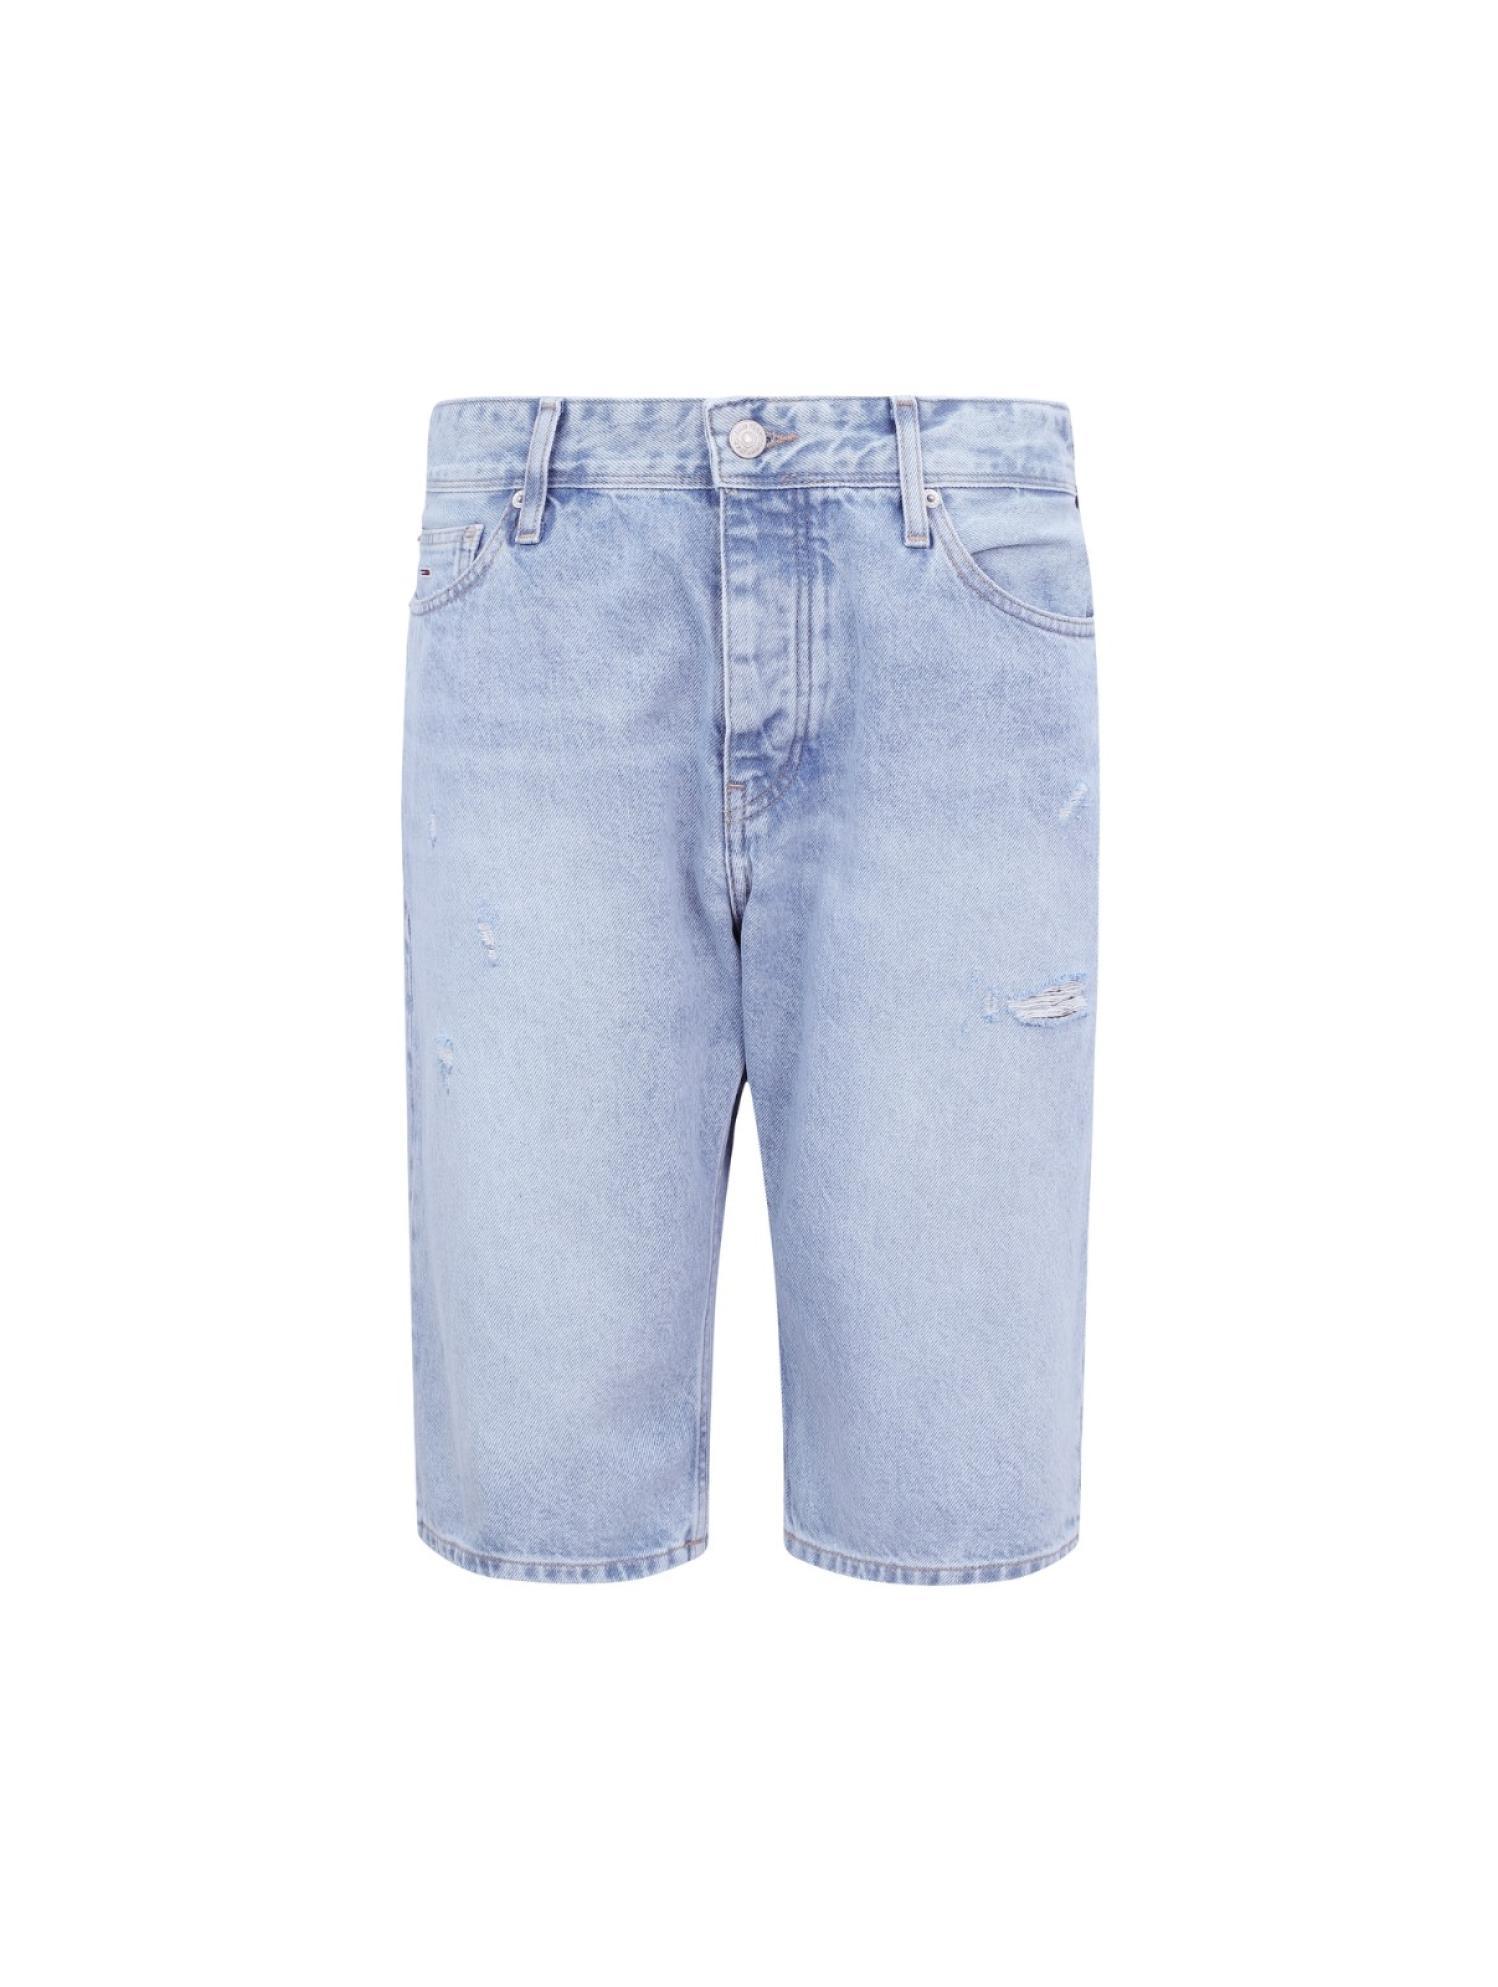 破洞牛仔短裤